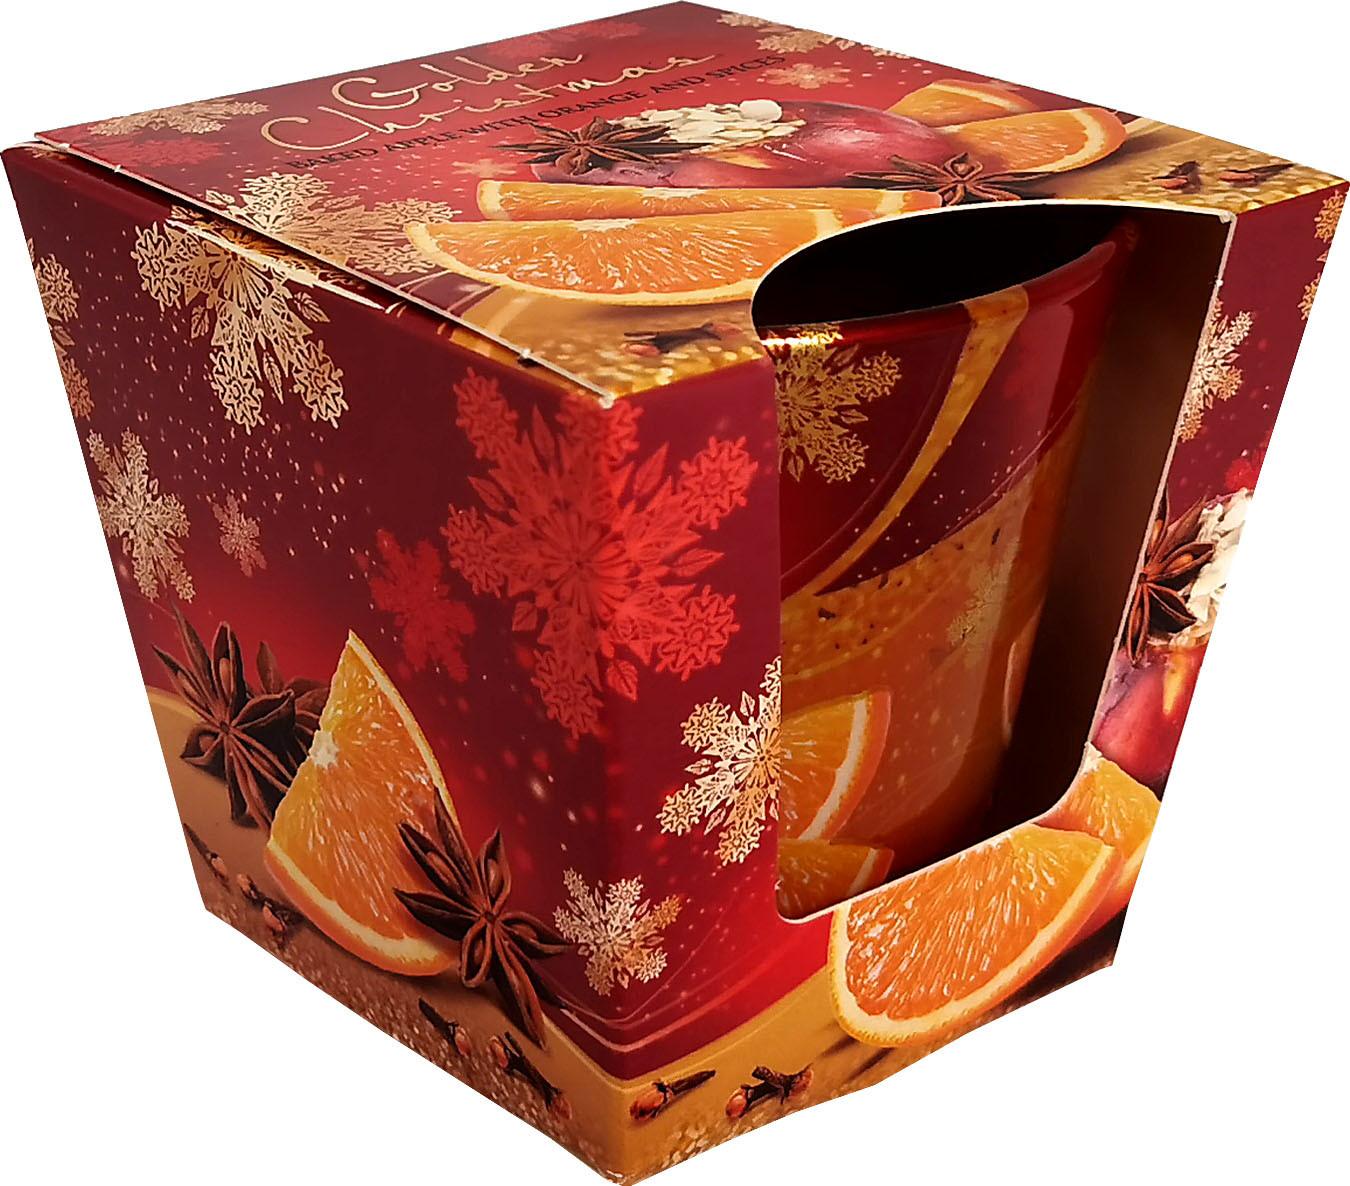 KNOX Duftkerze im Glas Golden Christmas - Bratapfel mit Orange